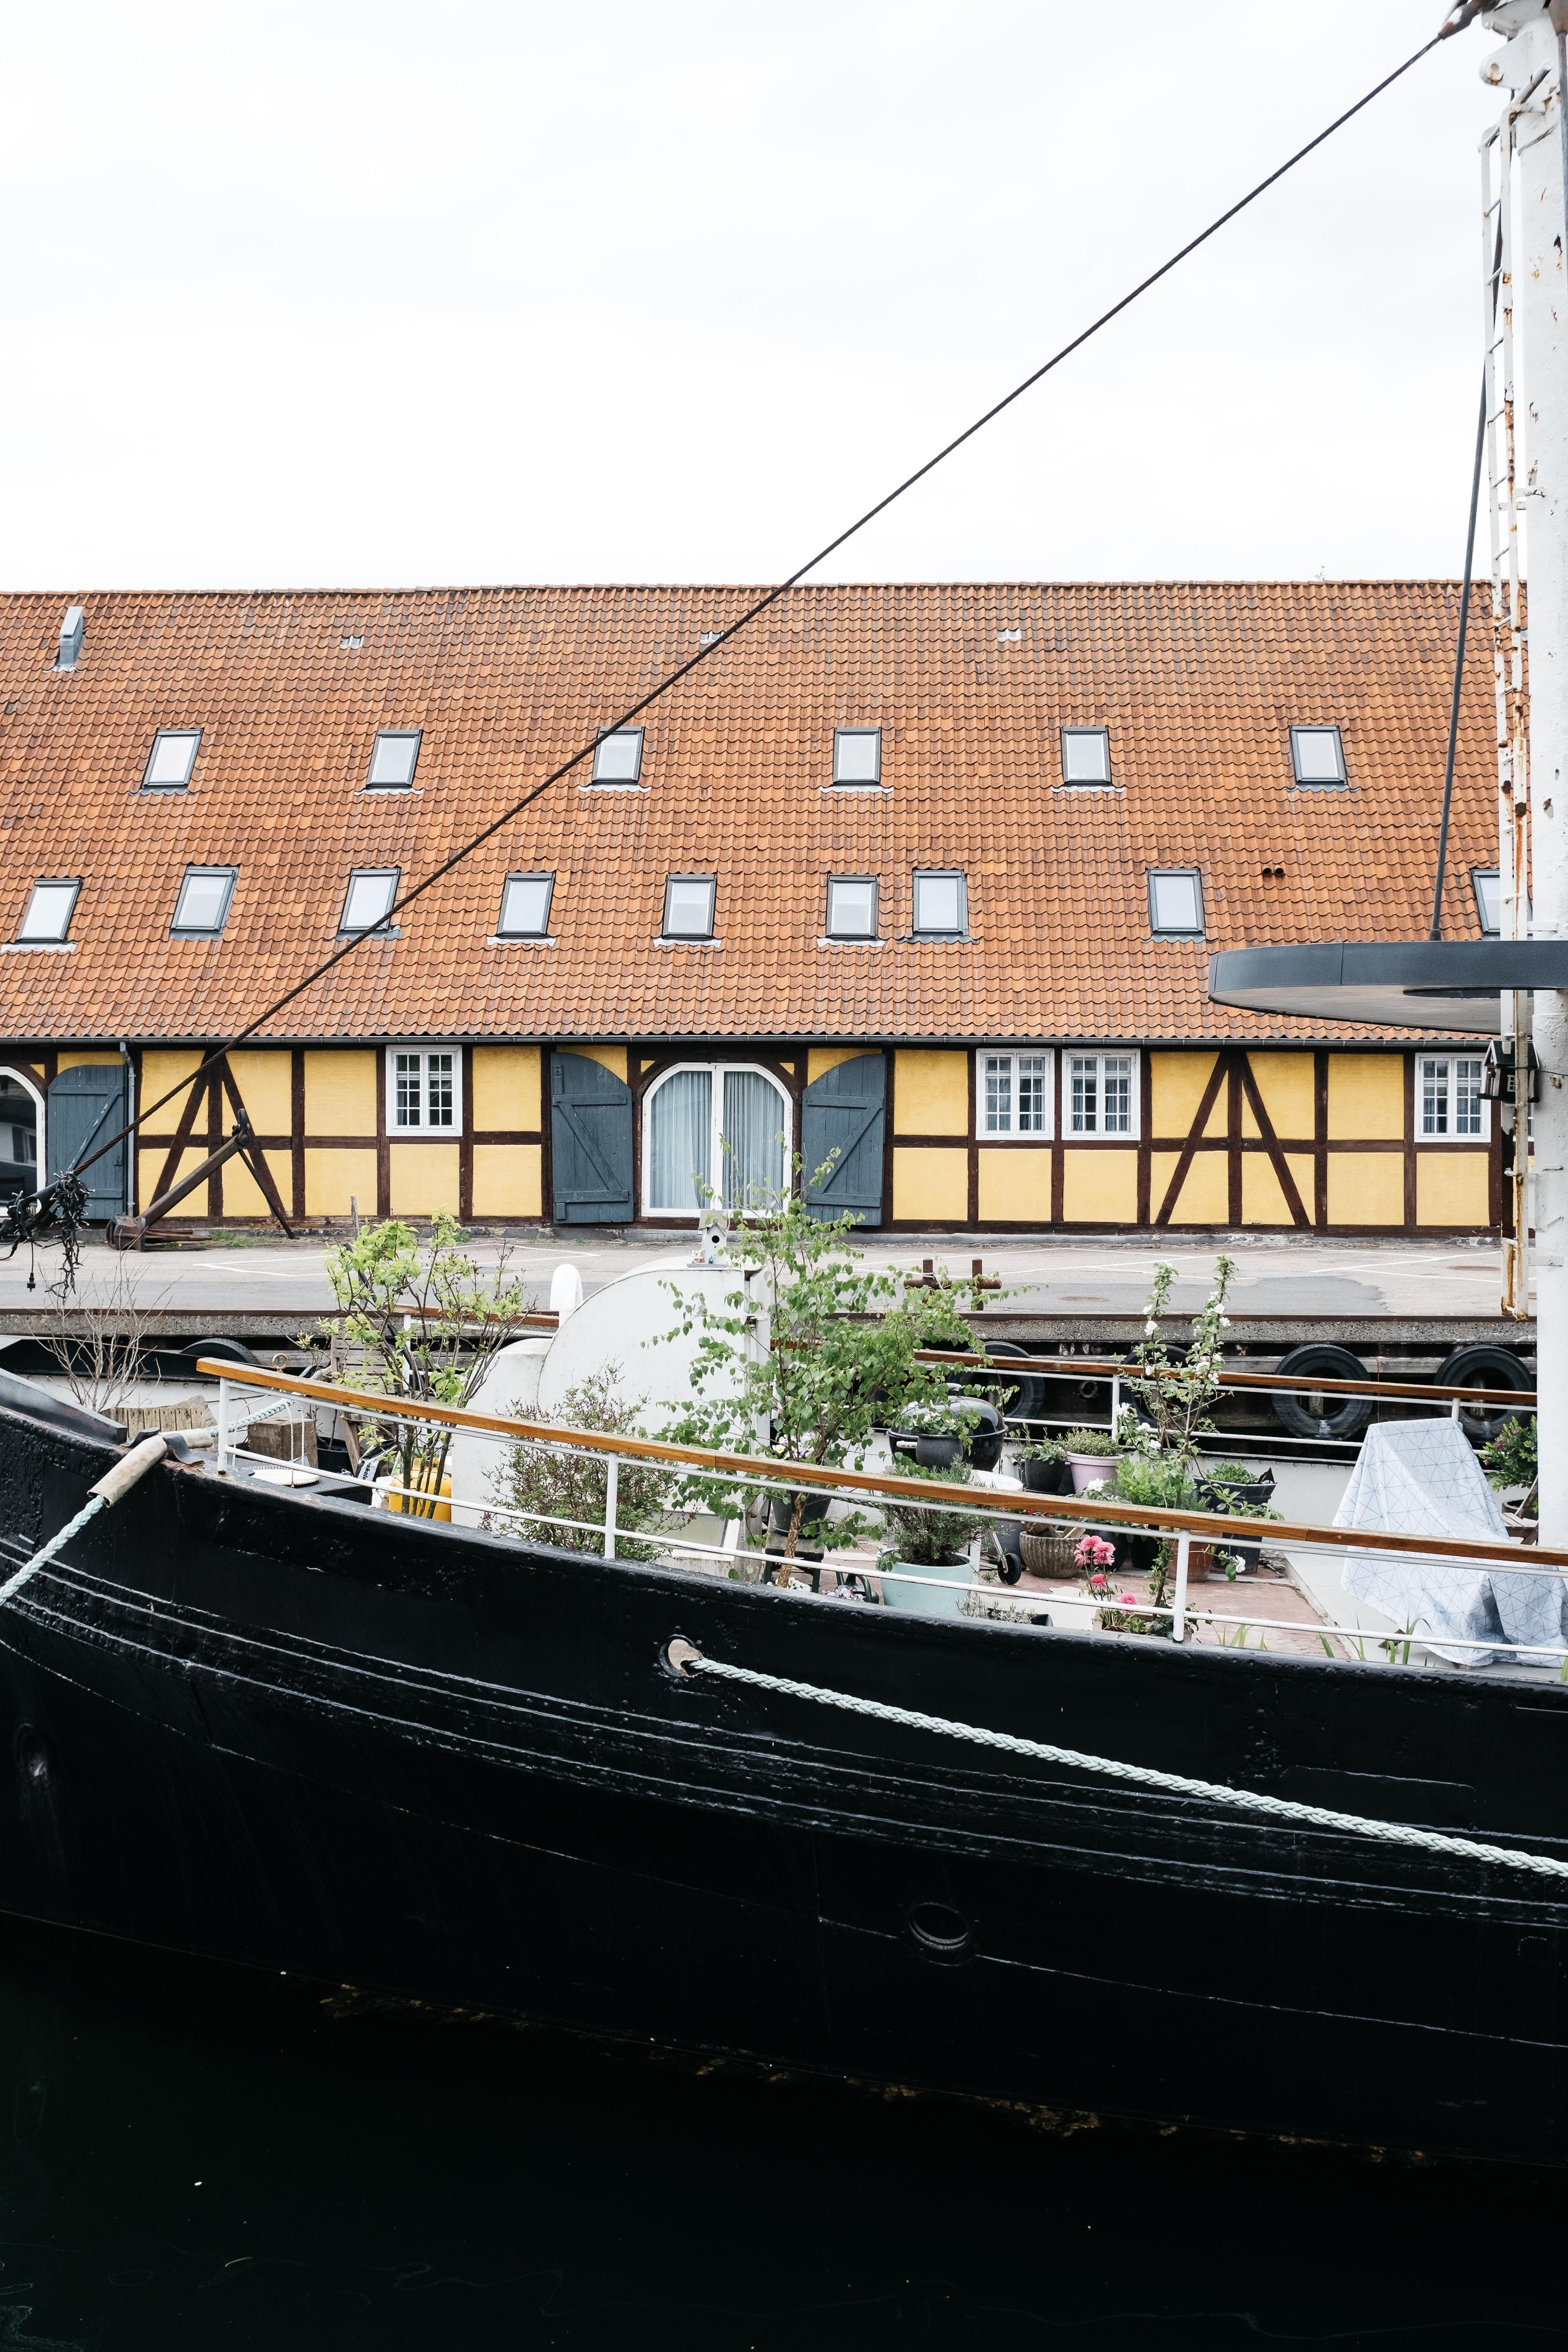 black boat beside the bay